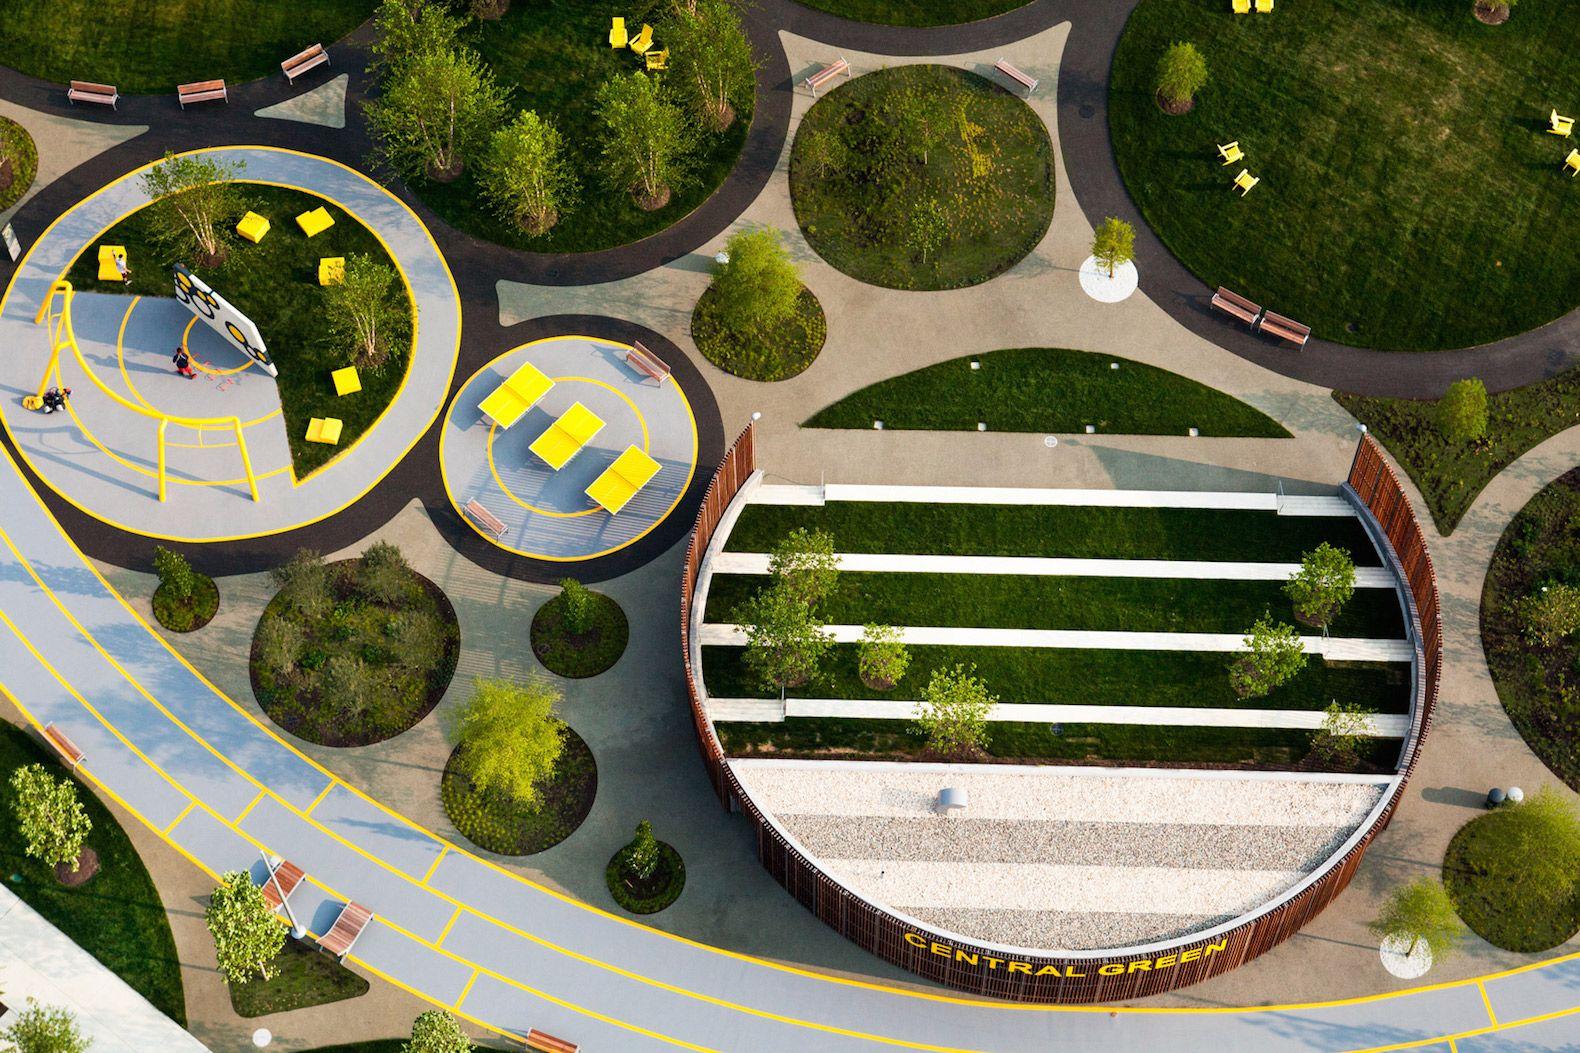 James Corner Field Operations Designs An Iconic Circular Park For The Philadelphia Navy Yard Landscape Architecture Urban Landscape Design Garden Architecture